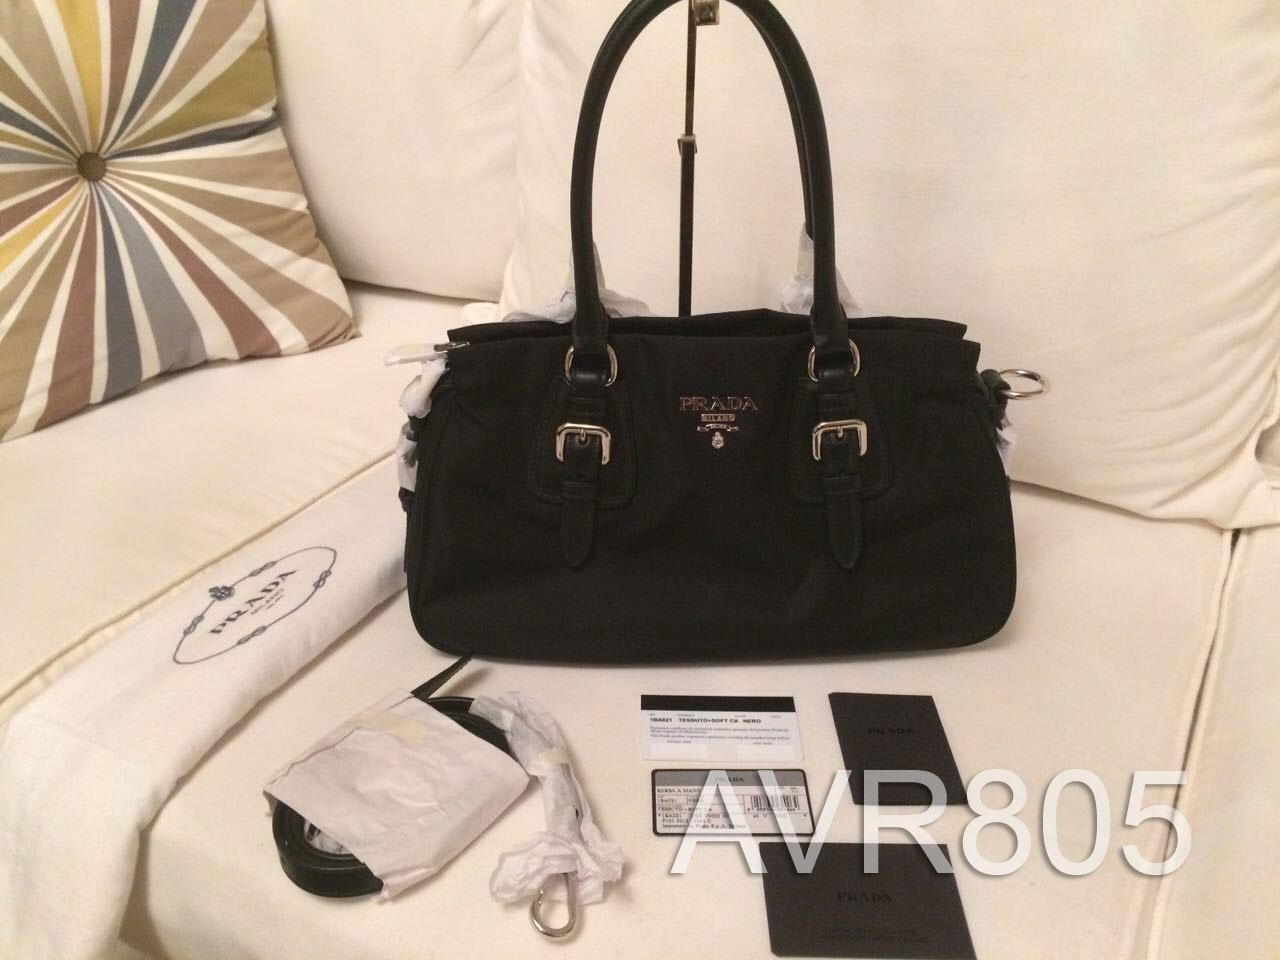 fb8e10dfc17e ... italy prada 1ba021 nero black tessuto soft calf top handle shopping tote  brand new d79c6 f57f9